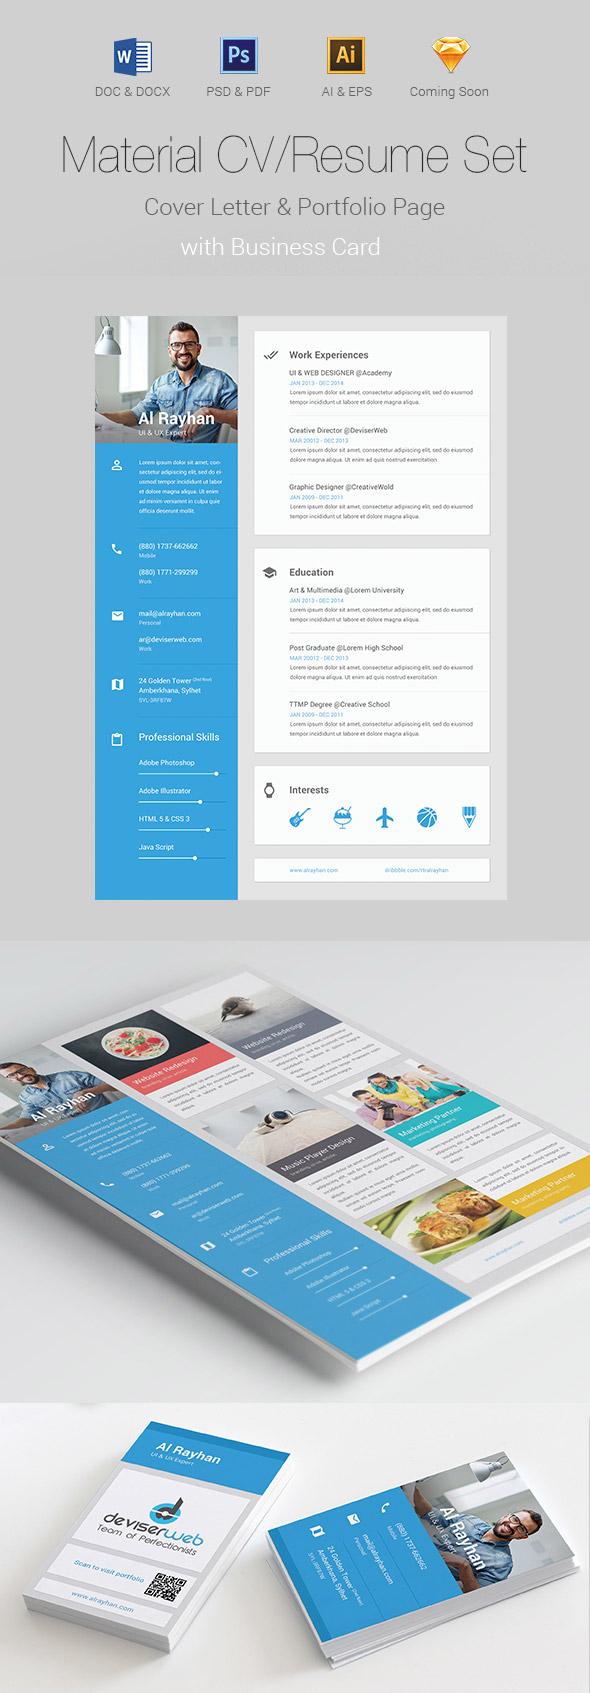 Material CV/Resume Design Set